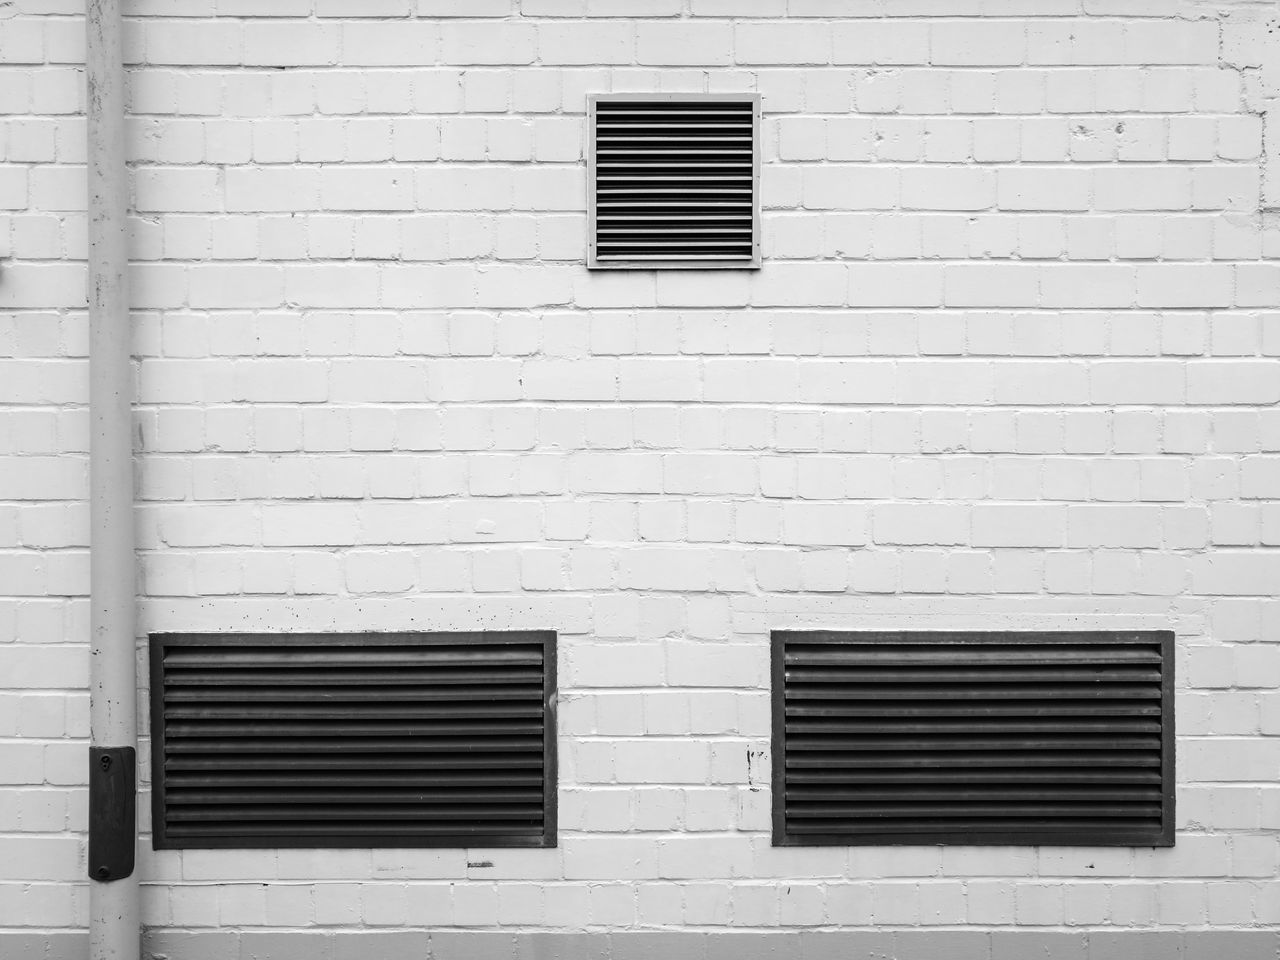 Monochromewall Architectural Detail Architecture Architecture_collection Architecturelovers Blackandwhite Photography Brick Wall Building Exterior Built Structure Cityexplorer Close-up Minimal Minimalism Minimalist Architecture Minimalistic Monochrome Monochrome Photography No People Schwarzweiß Simplicity Wall - Building Feature